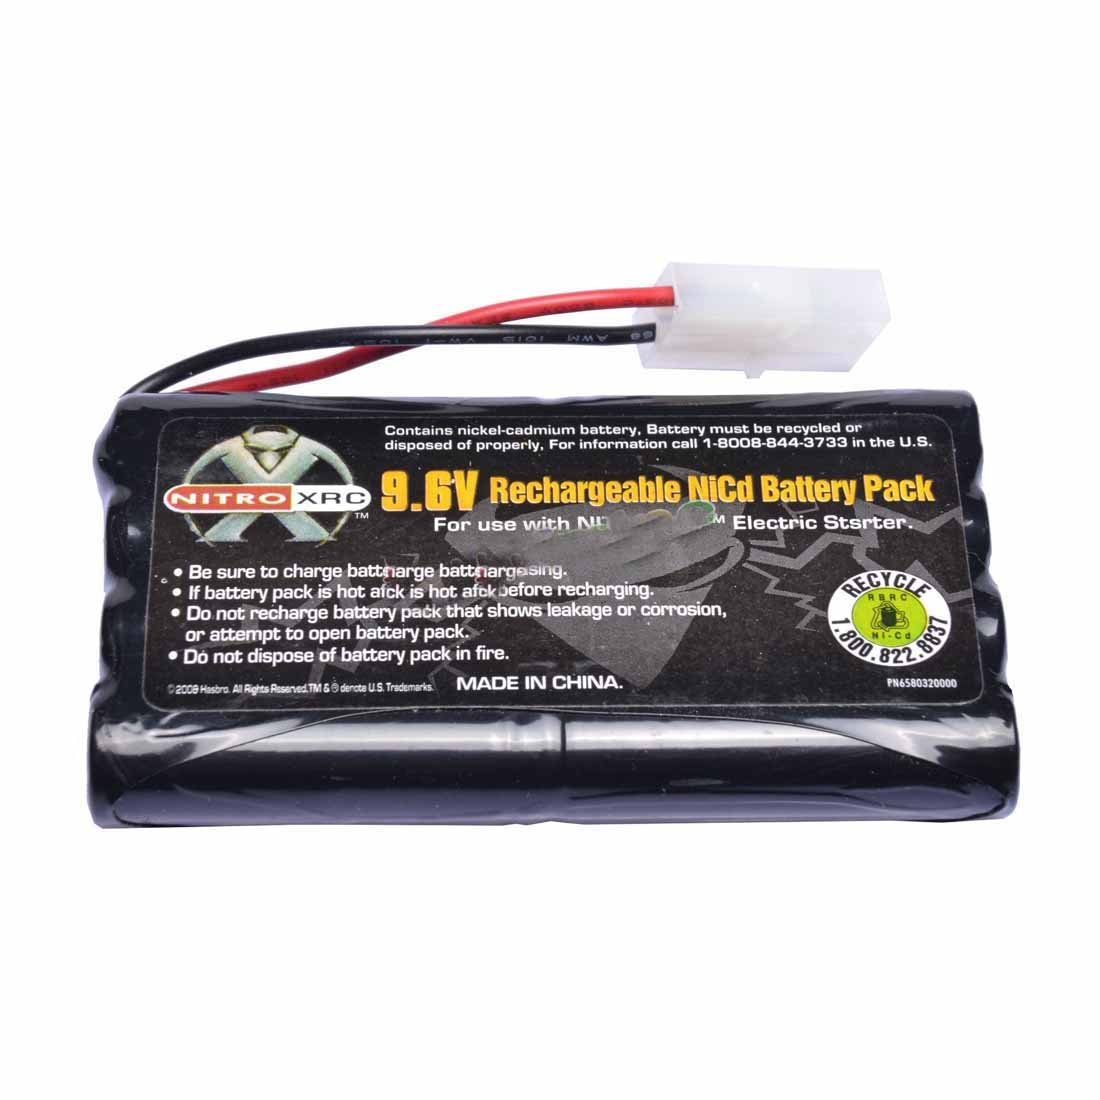 1 x ni-cd 9.6 V 2400 mAh充電式バッテリーパックTamiyaコネクタトップ販売アイテム   B01MS2627M